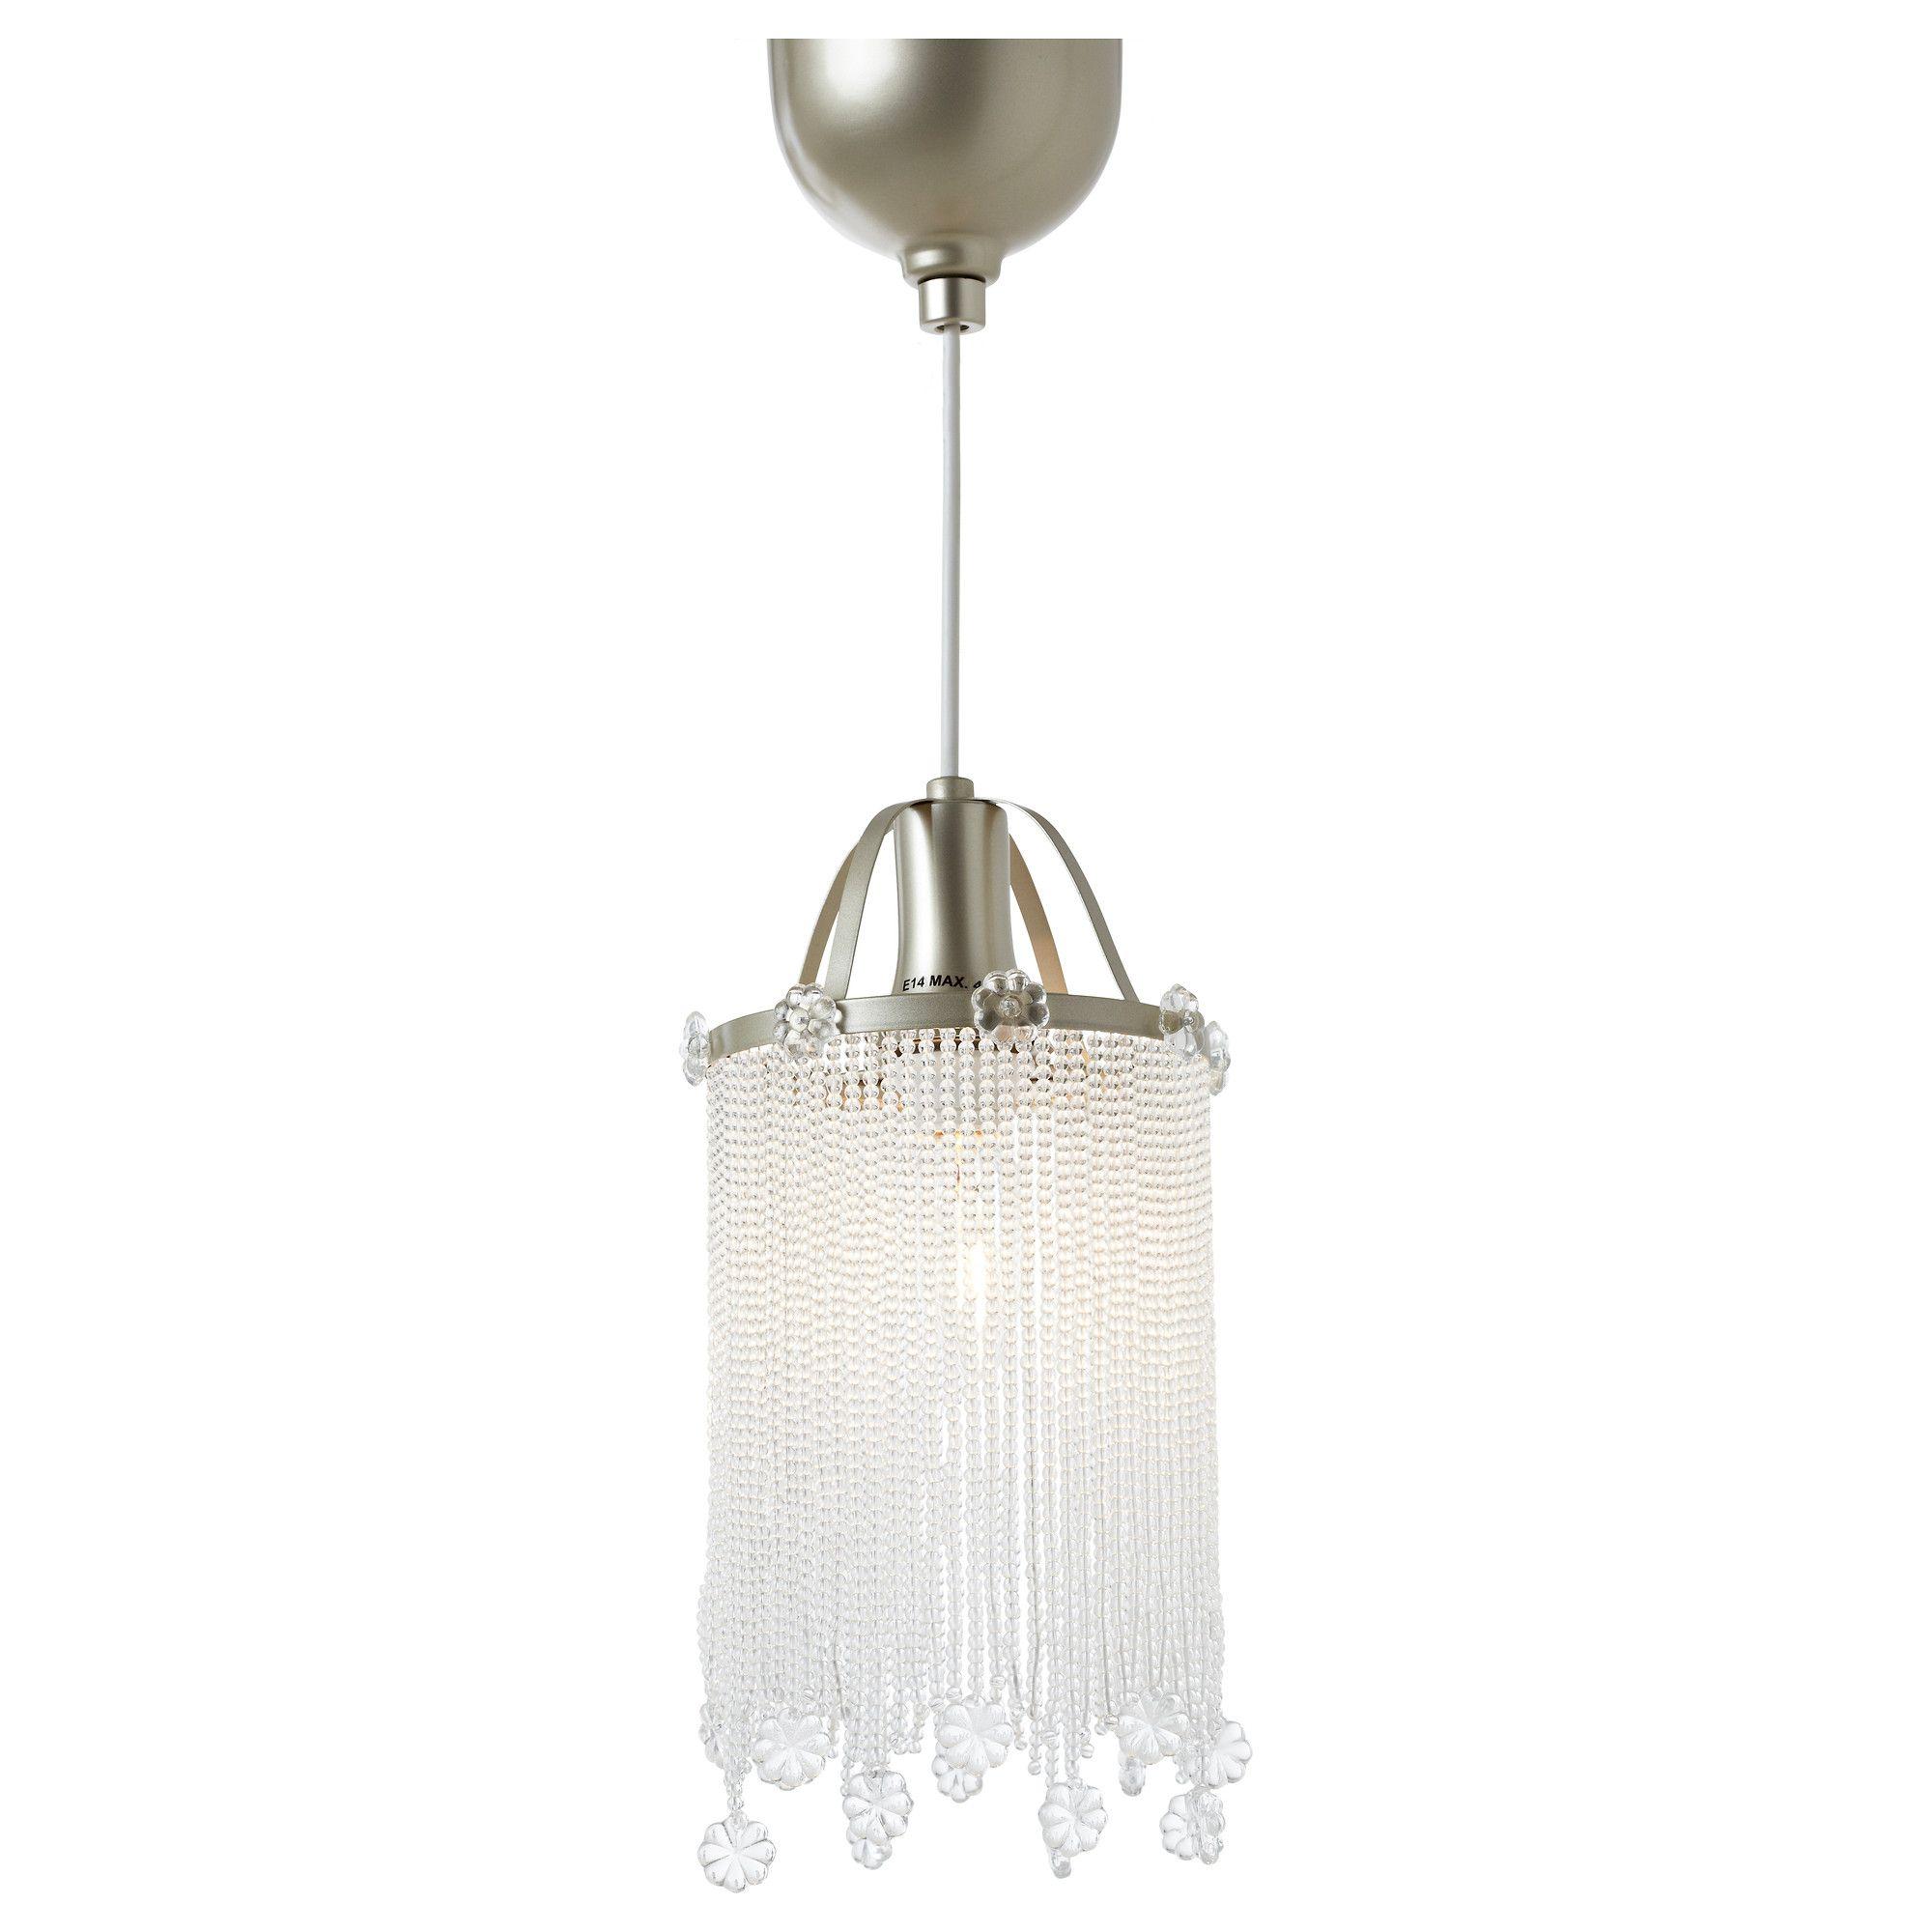 Sder pendant lamp pearlsflowers pendant lamps chandeliers and sder pendant lamp pearlsflowers arubaitofo Choice Image